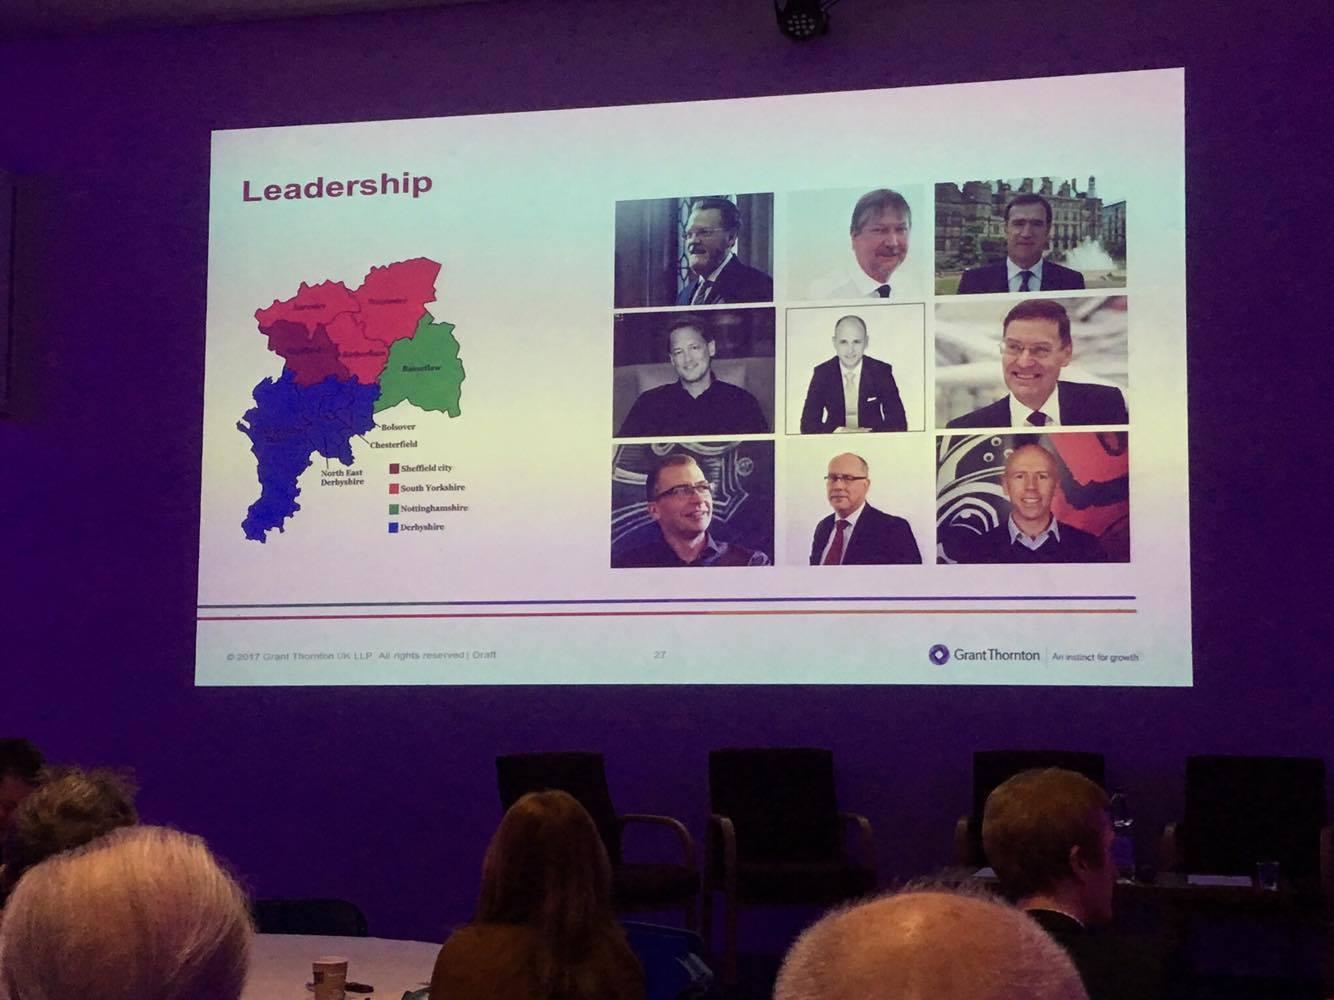 All-male line up for leadership slide.